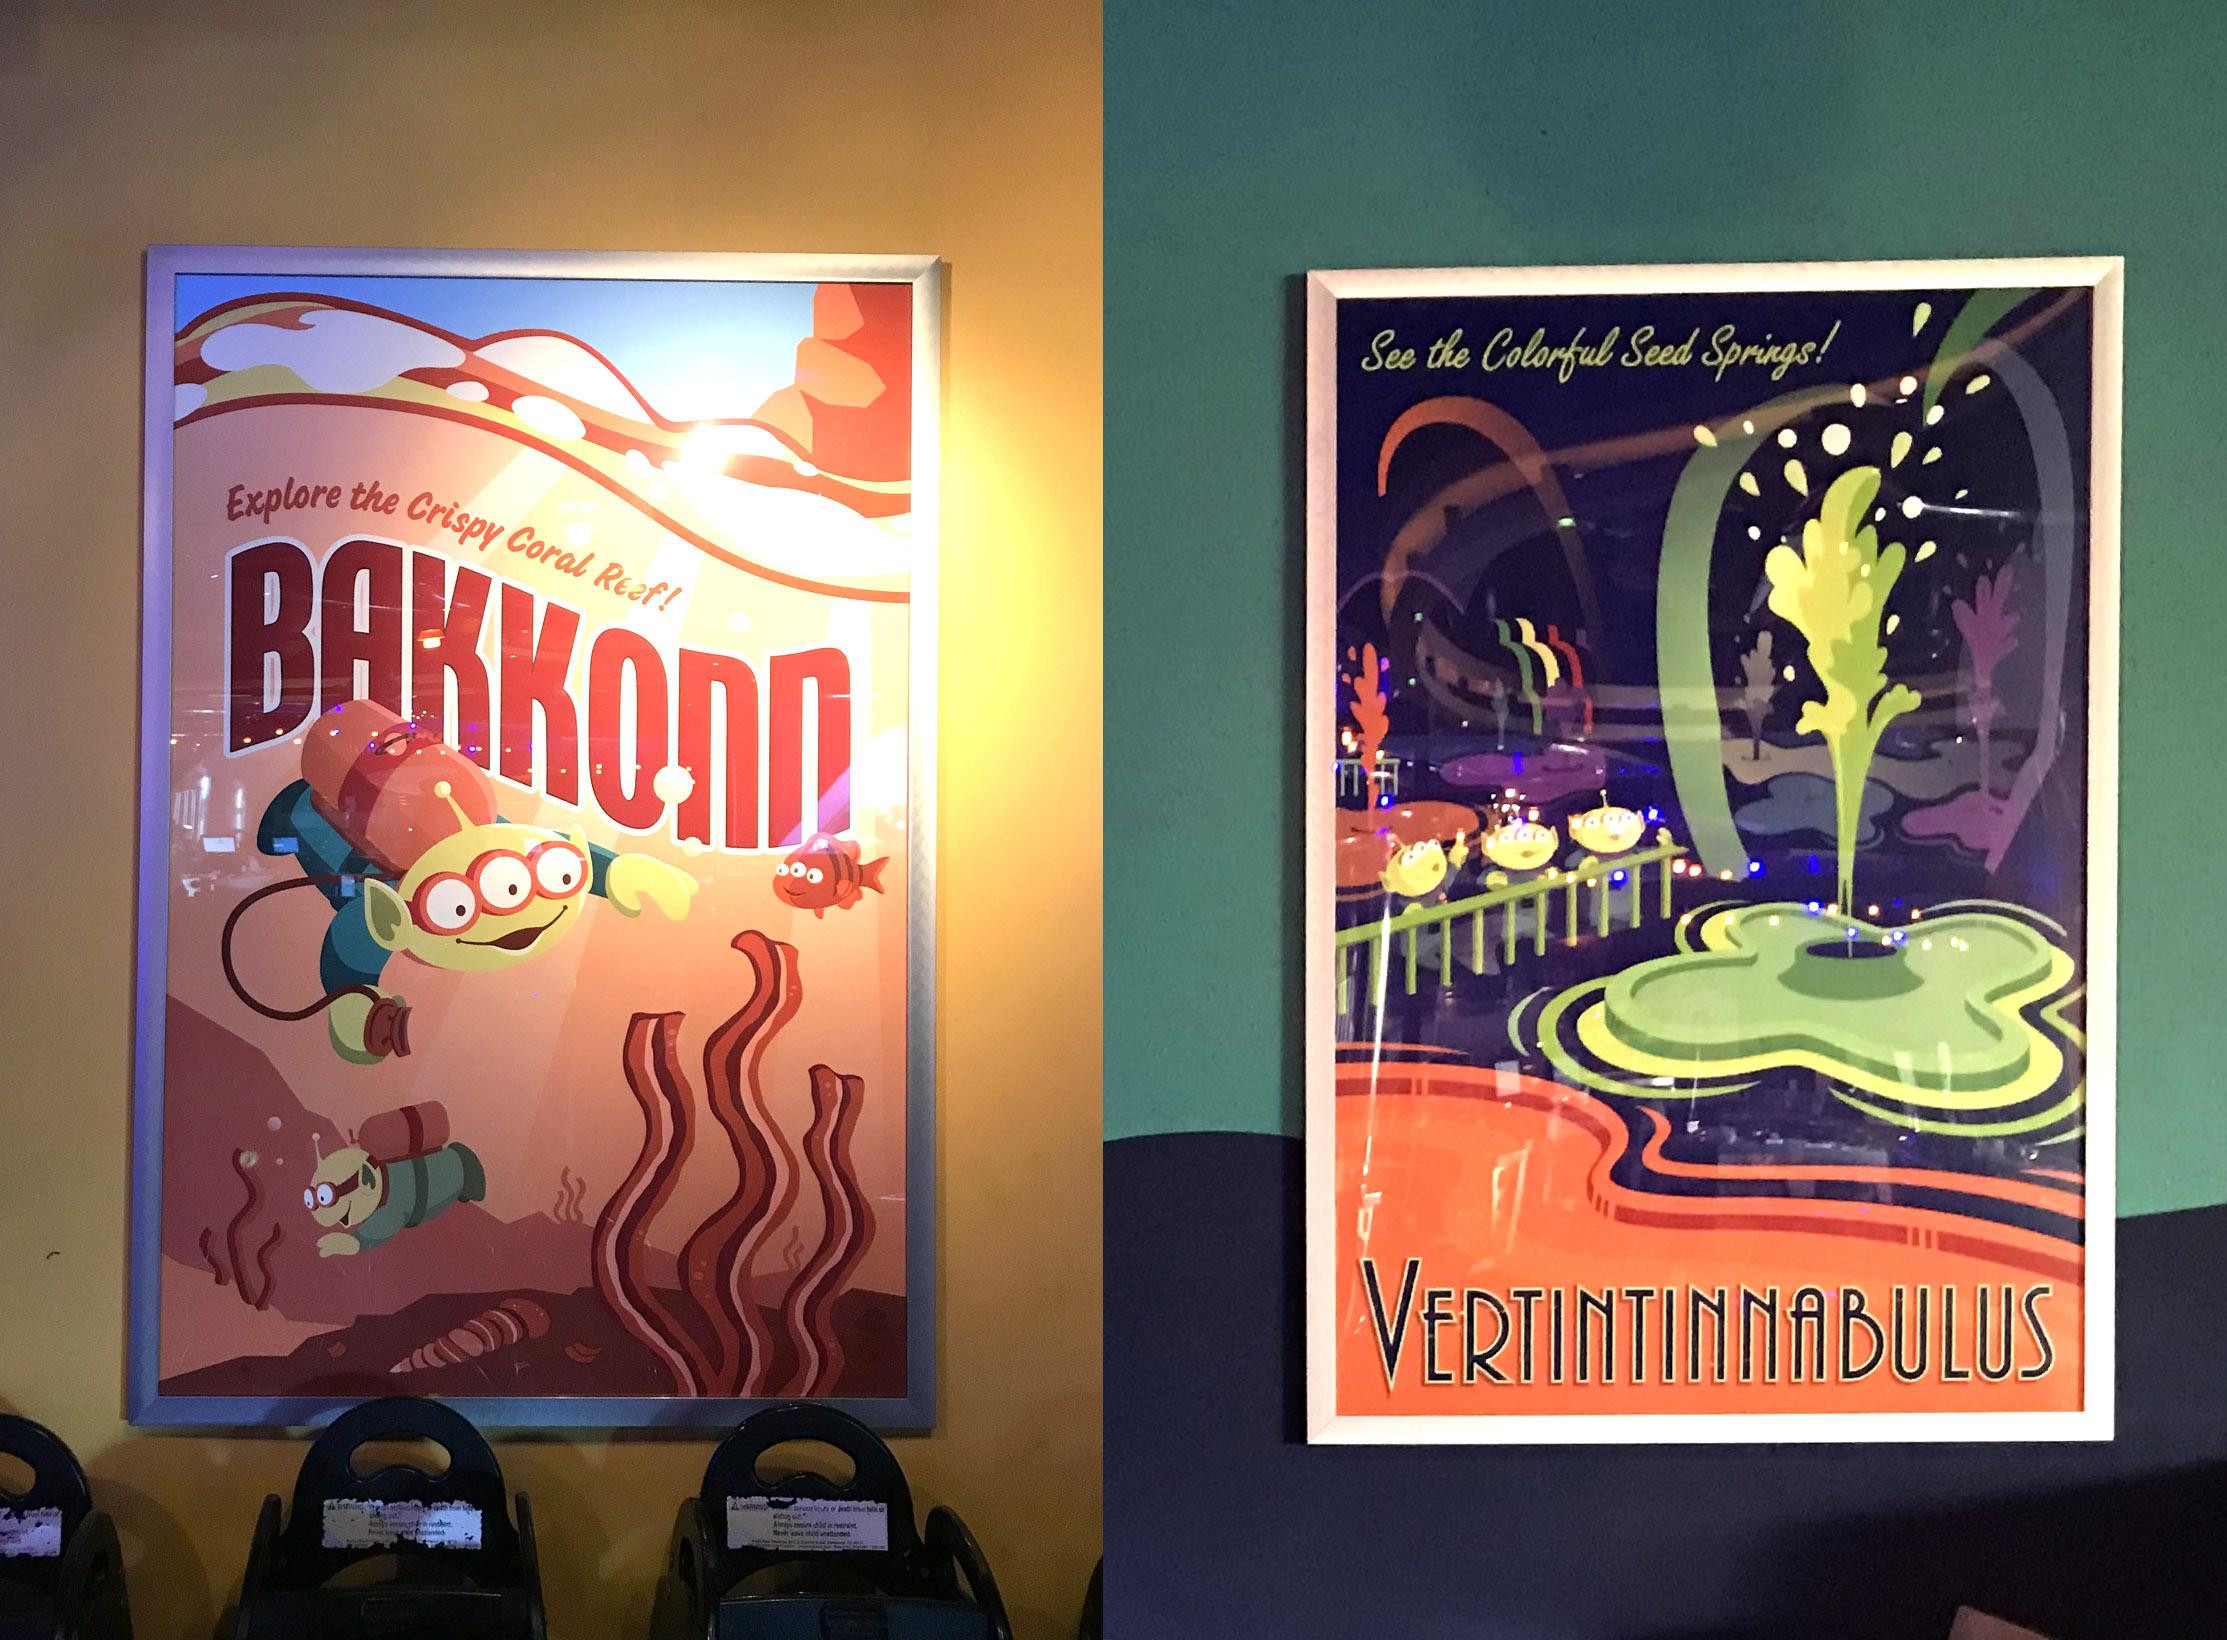 Pizza Planet Posters, Overlay for Pixar Fest, Disneyland, CA